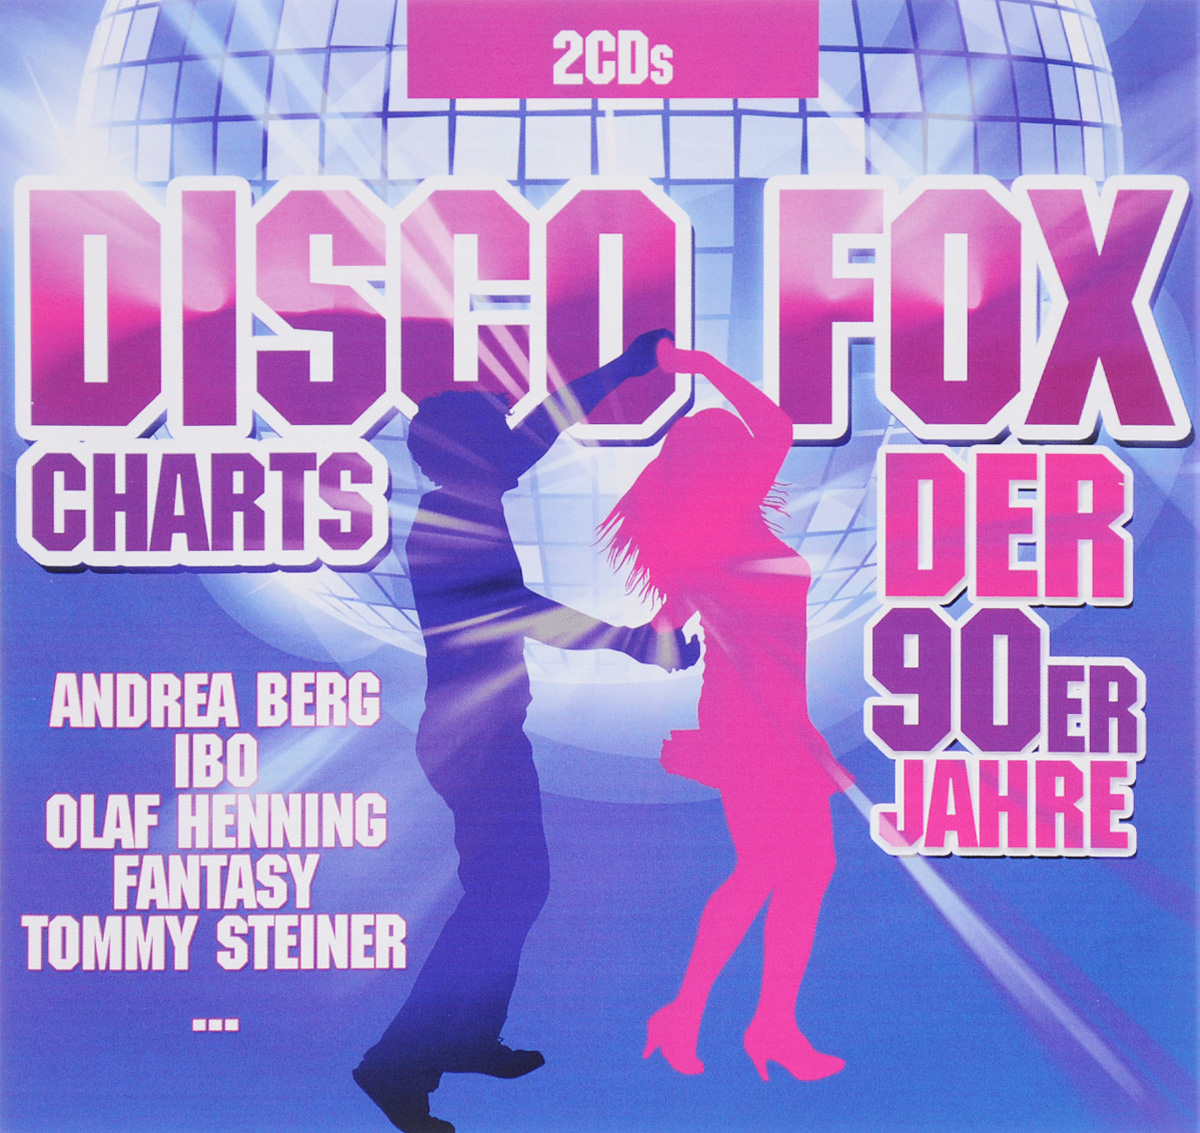 Ibo,Andrea Berg,Олаф Хеннинг,Олаф Бергер,Мэри Рос,Вики Леандрос,Fantasy,Nico Gemba,Эльке Мартенс Disco Fox Charts Der 90er Jahre (2 CD) deutscher disco fox 2011 2 cd